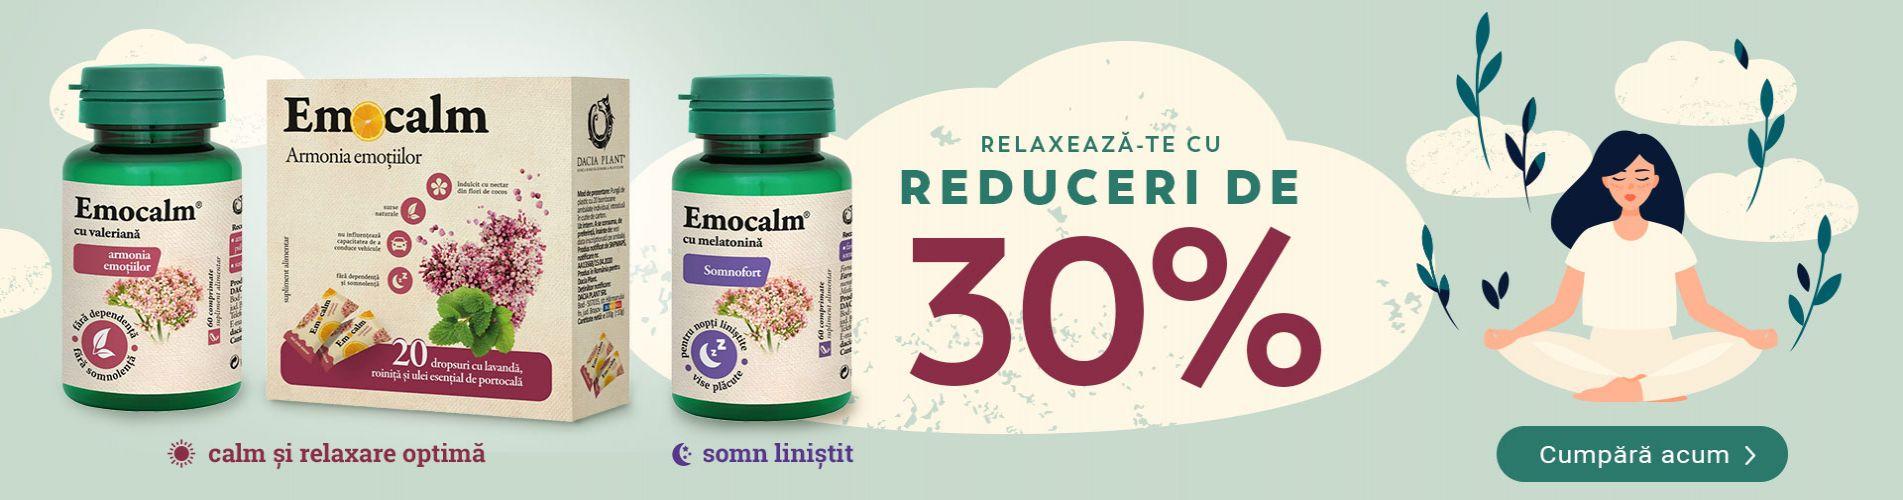 https://www.daciaplant.ro/emocalm-produse-dacia-plant